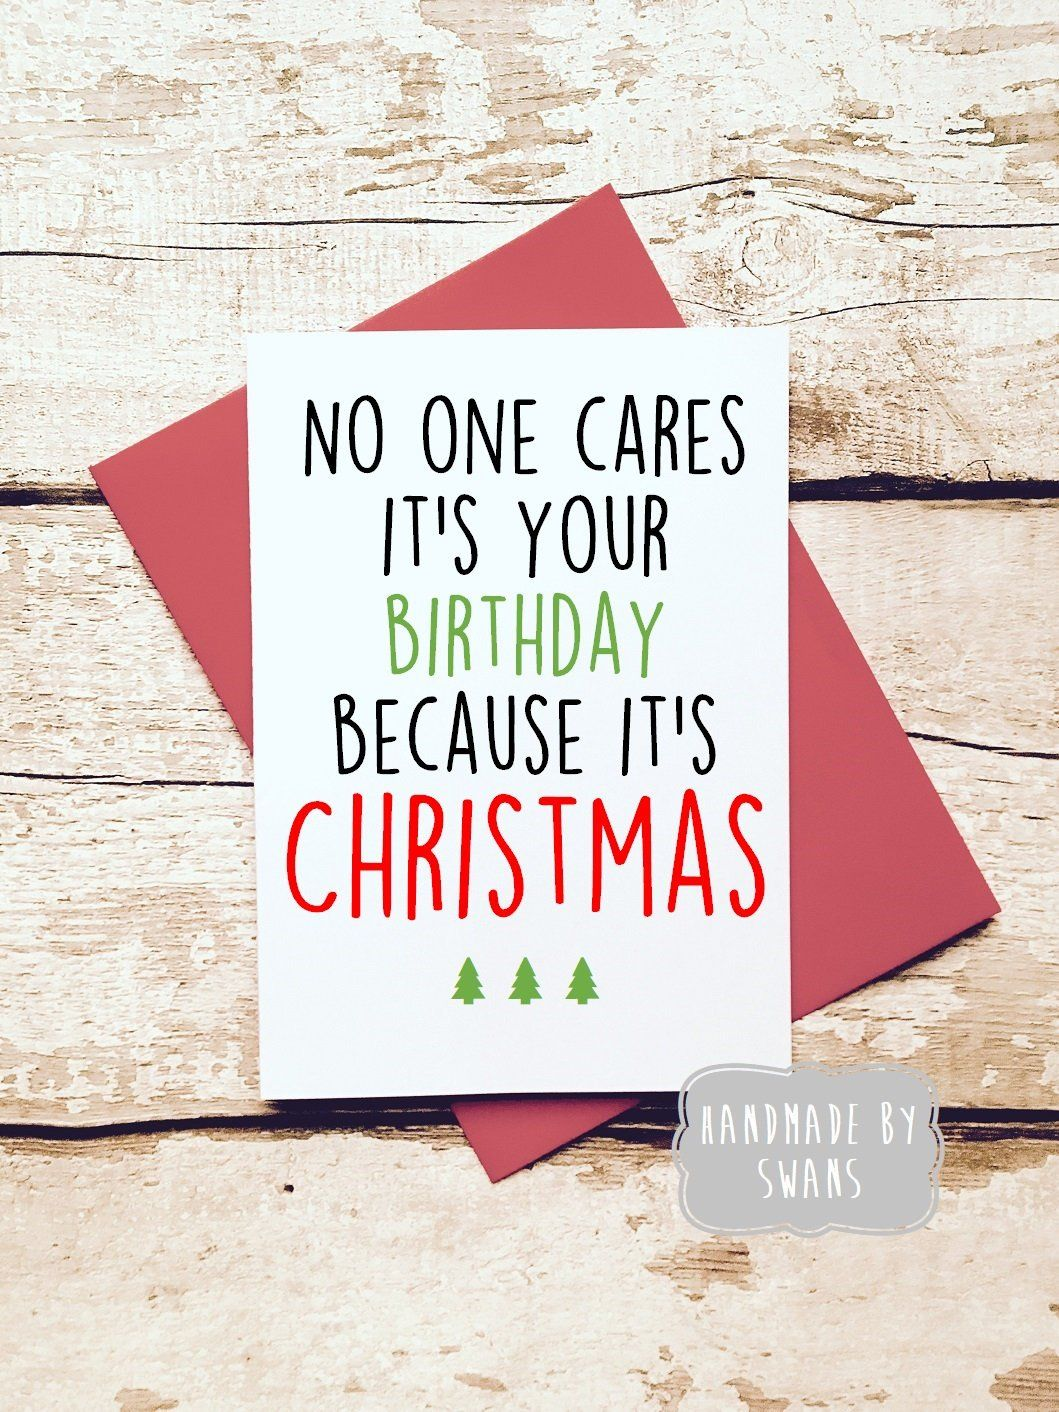 Christmas Bday Cards.Funny Christmas Card Birthday Card Christmas Card Funny December